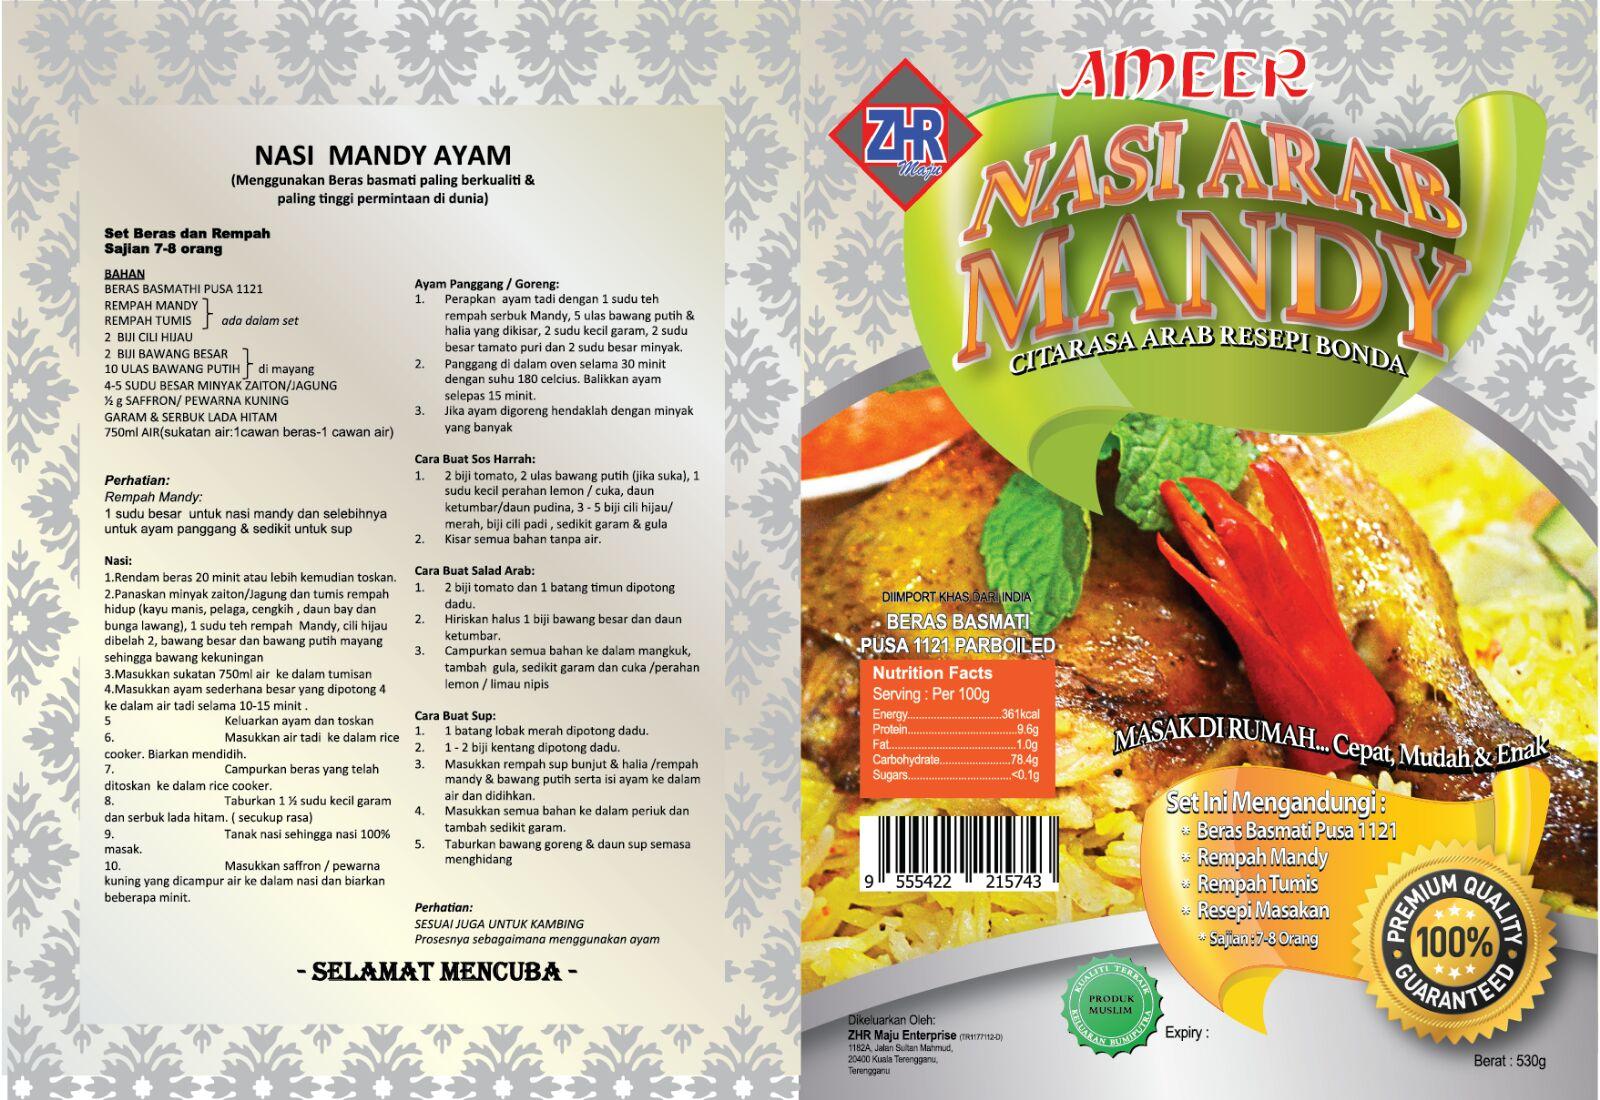 Aneka Resepi Masakan Yang Menyelerakan !!!: 6 Jenis Produk 'Ameer ZHR'